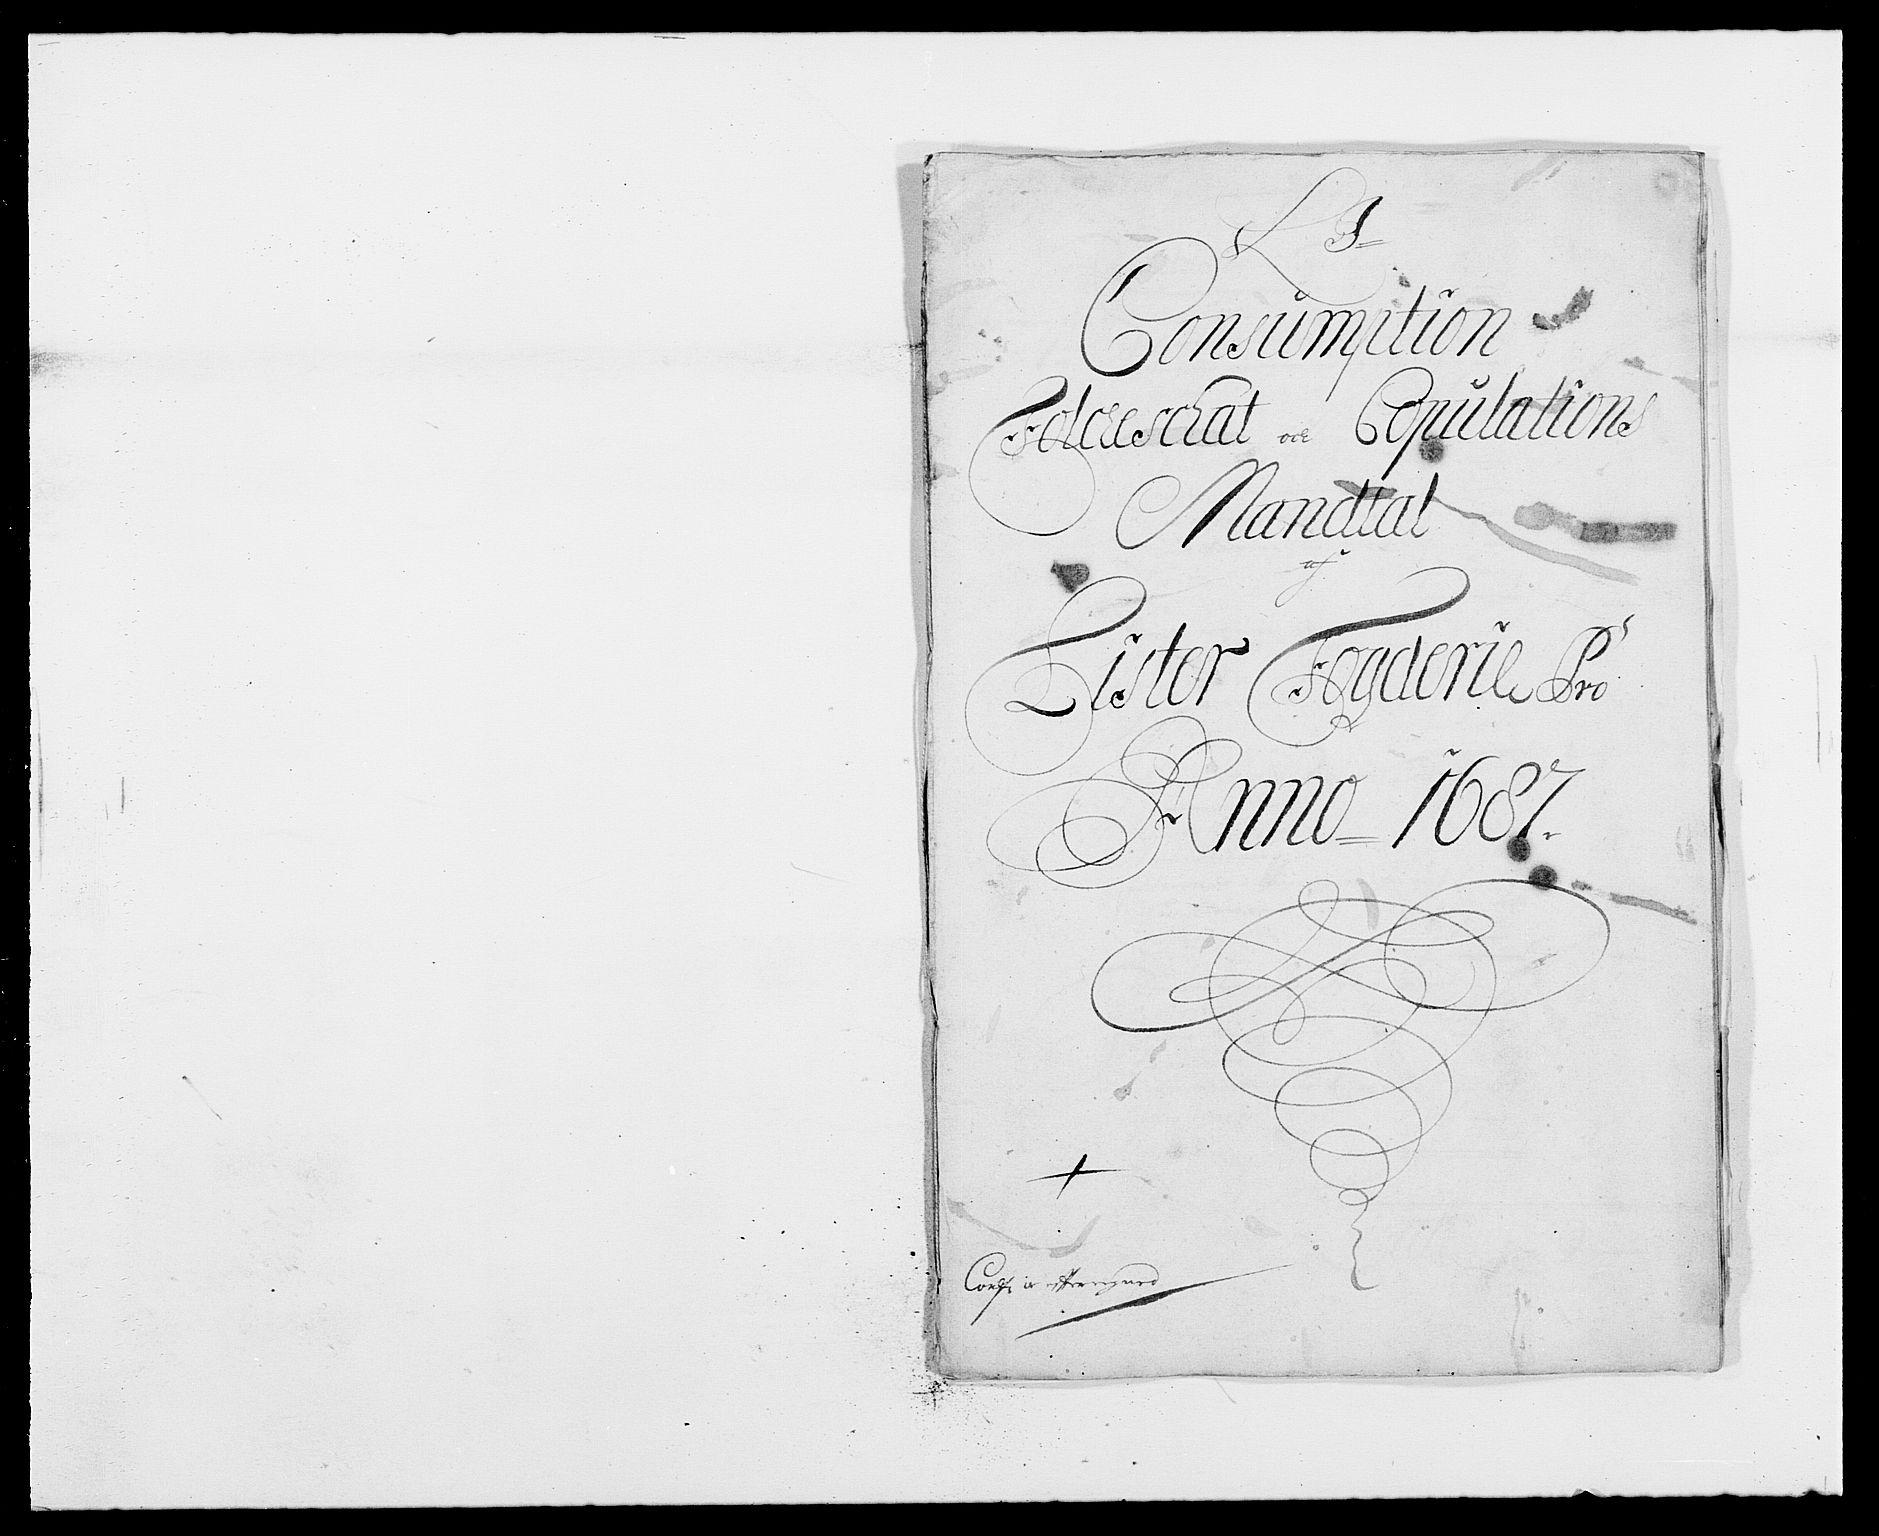 RA, Rentekammeret inntil 1814, Reviderte regnskaper, Fogderegnskap, R41/L2534: Fogderegnskap Lista, 1686-1688, s. 147